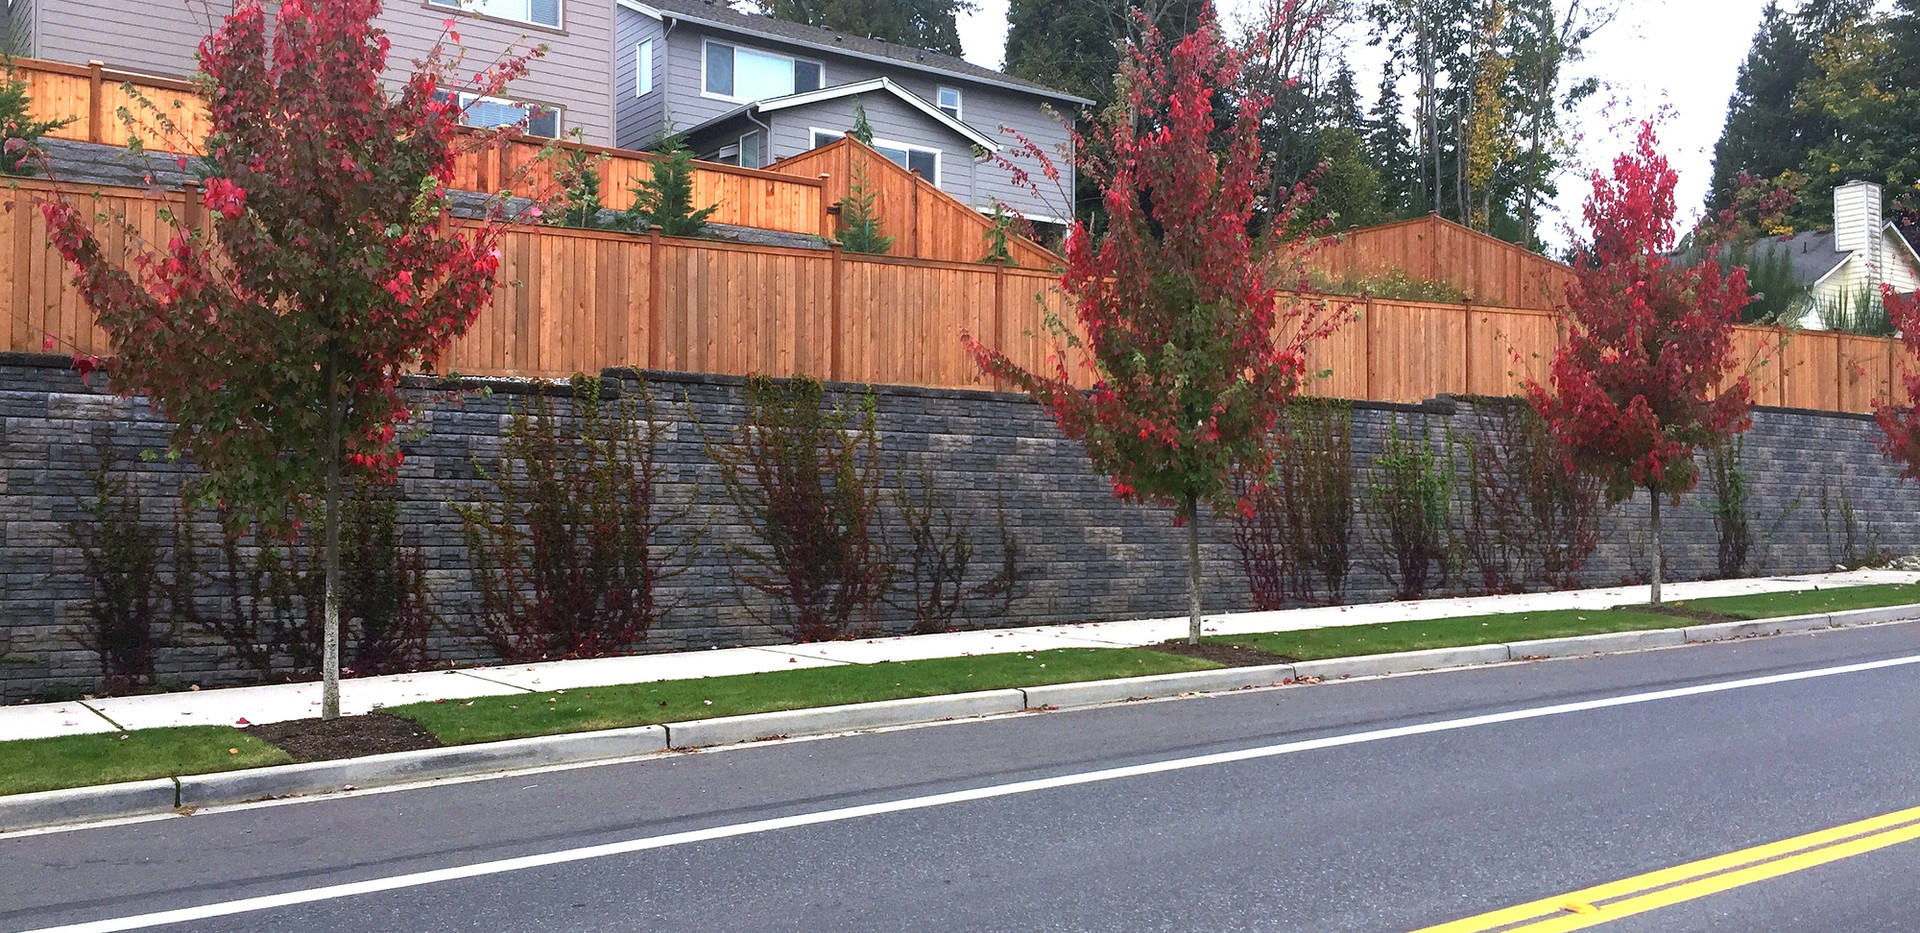 Quadrant Homes, Woodinville, WA Distant Street View